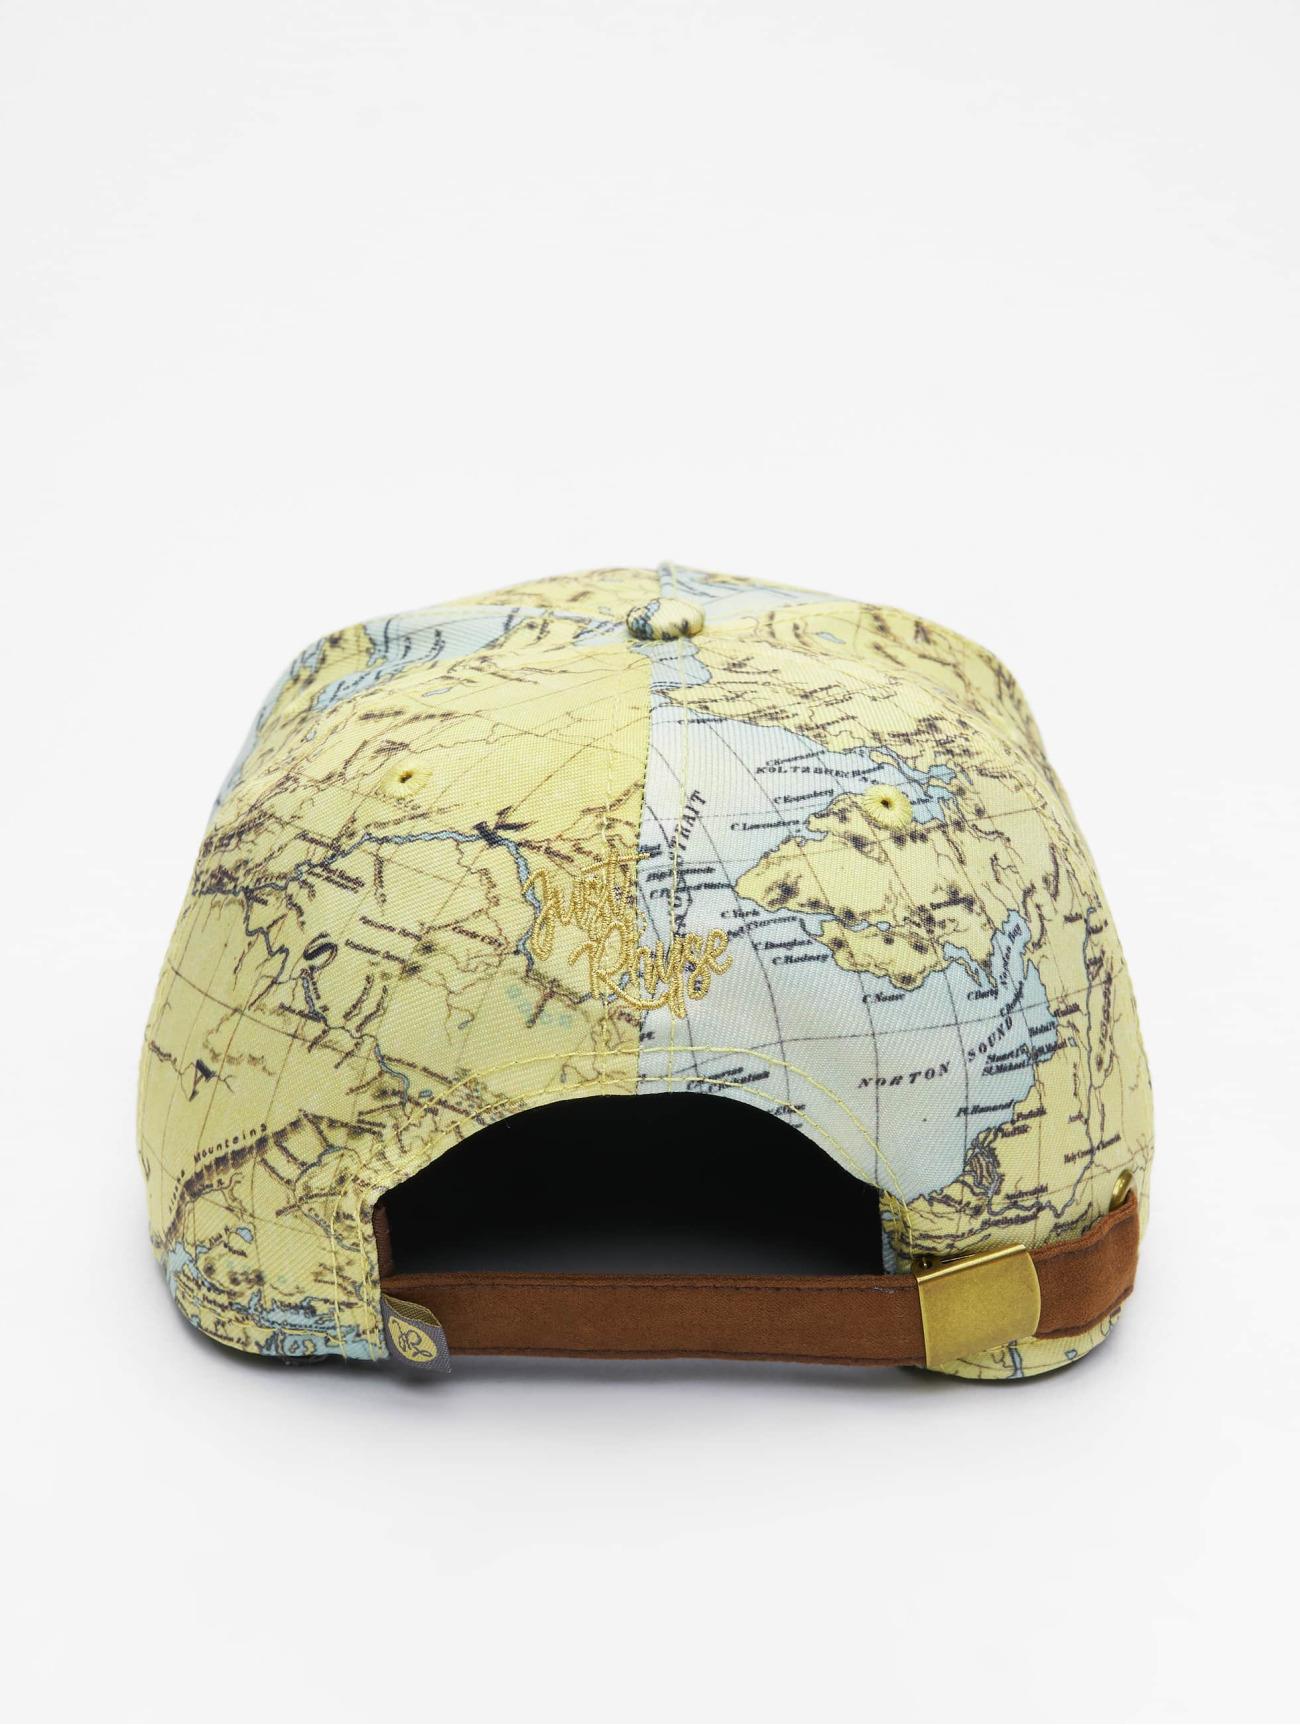 Just Rhyse  Portage  multicolore  Casquette Snapback & Strapback  394478 Homme Casquettes